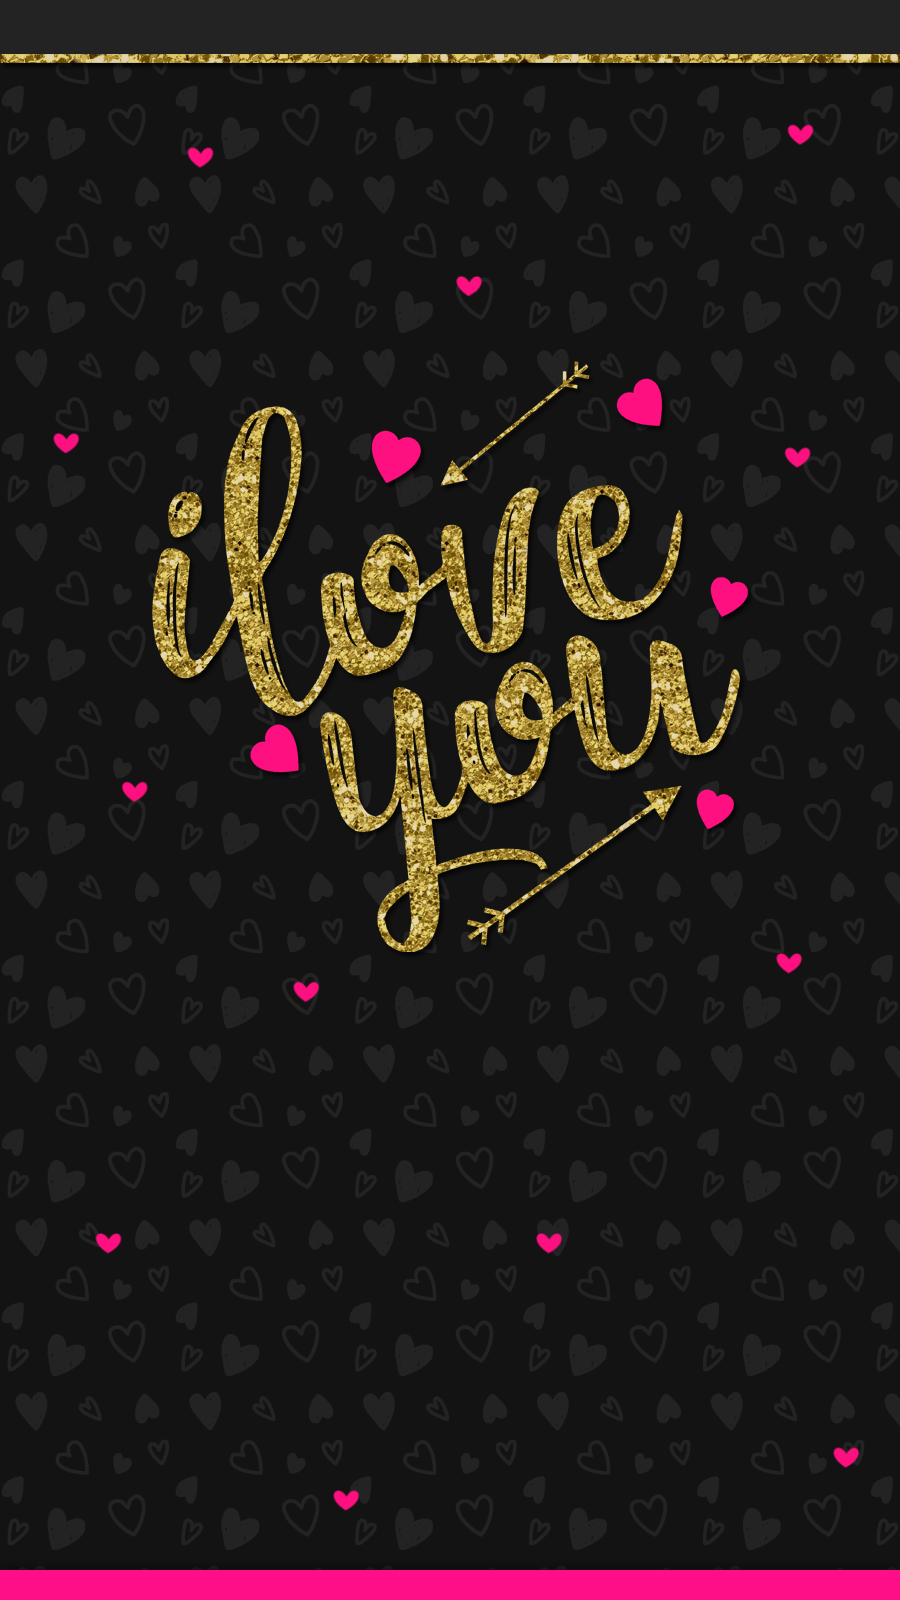 Wallpaper Cute Wallpaper For Phone Valentines Wallpaper Love Wallpaper